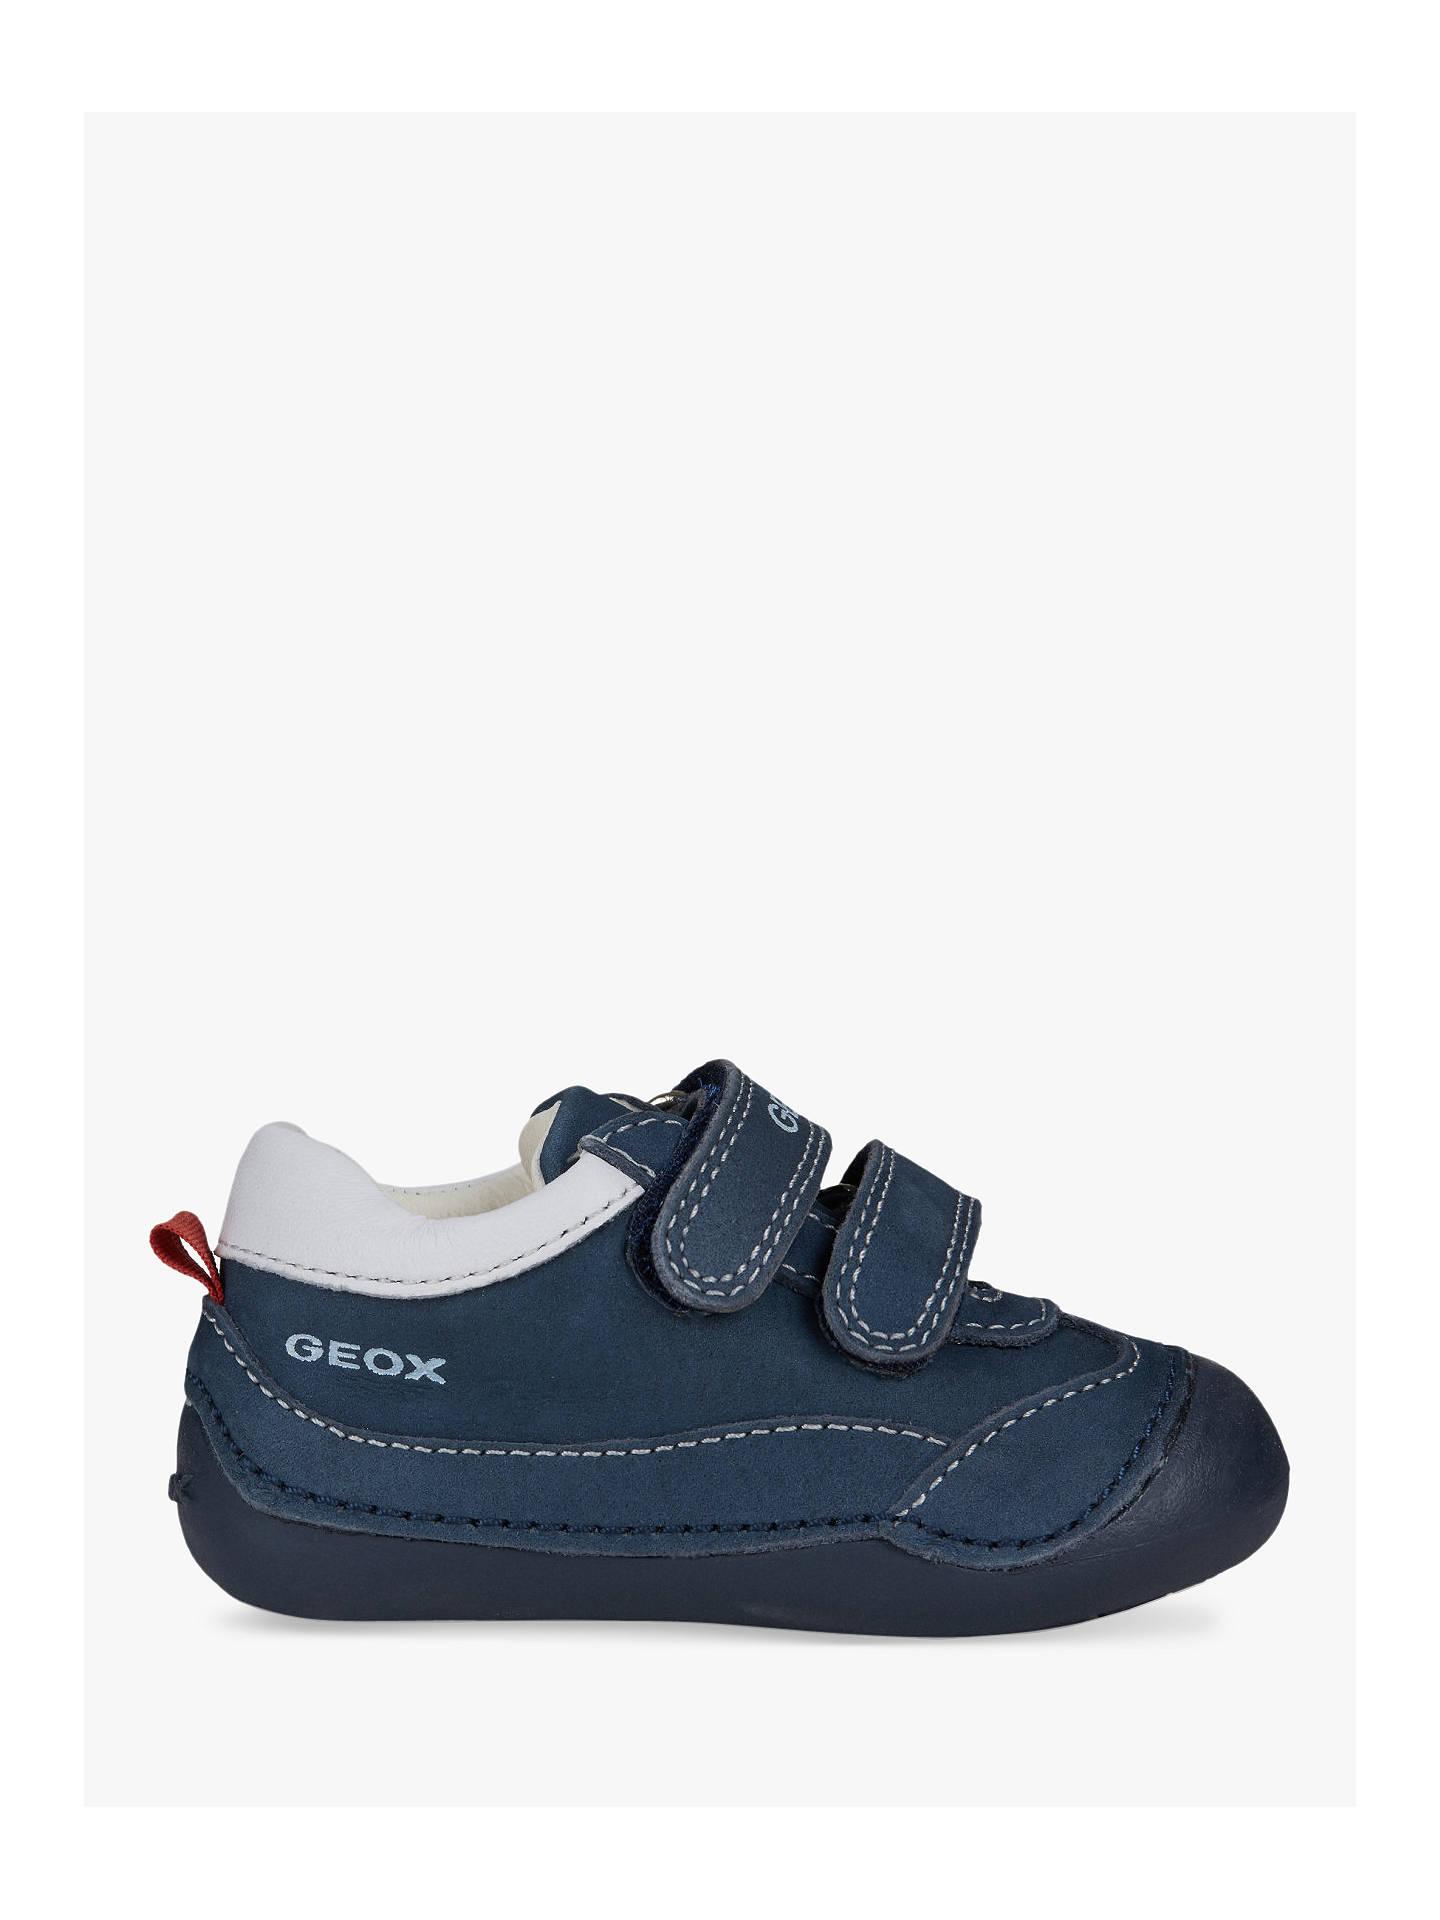 776f7b1257 Buy Geox Children's Tutim B Riptape Shoes, Navy/White, 19 Online at  johnlewis ...